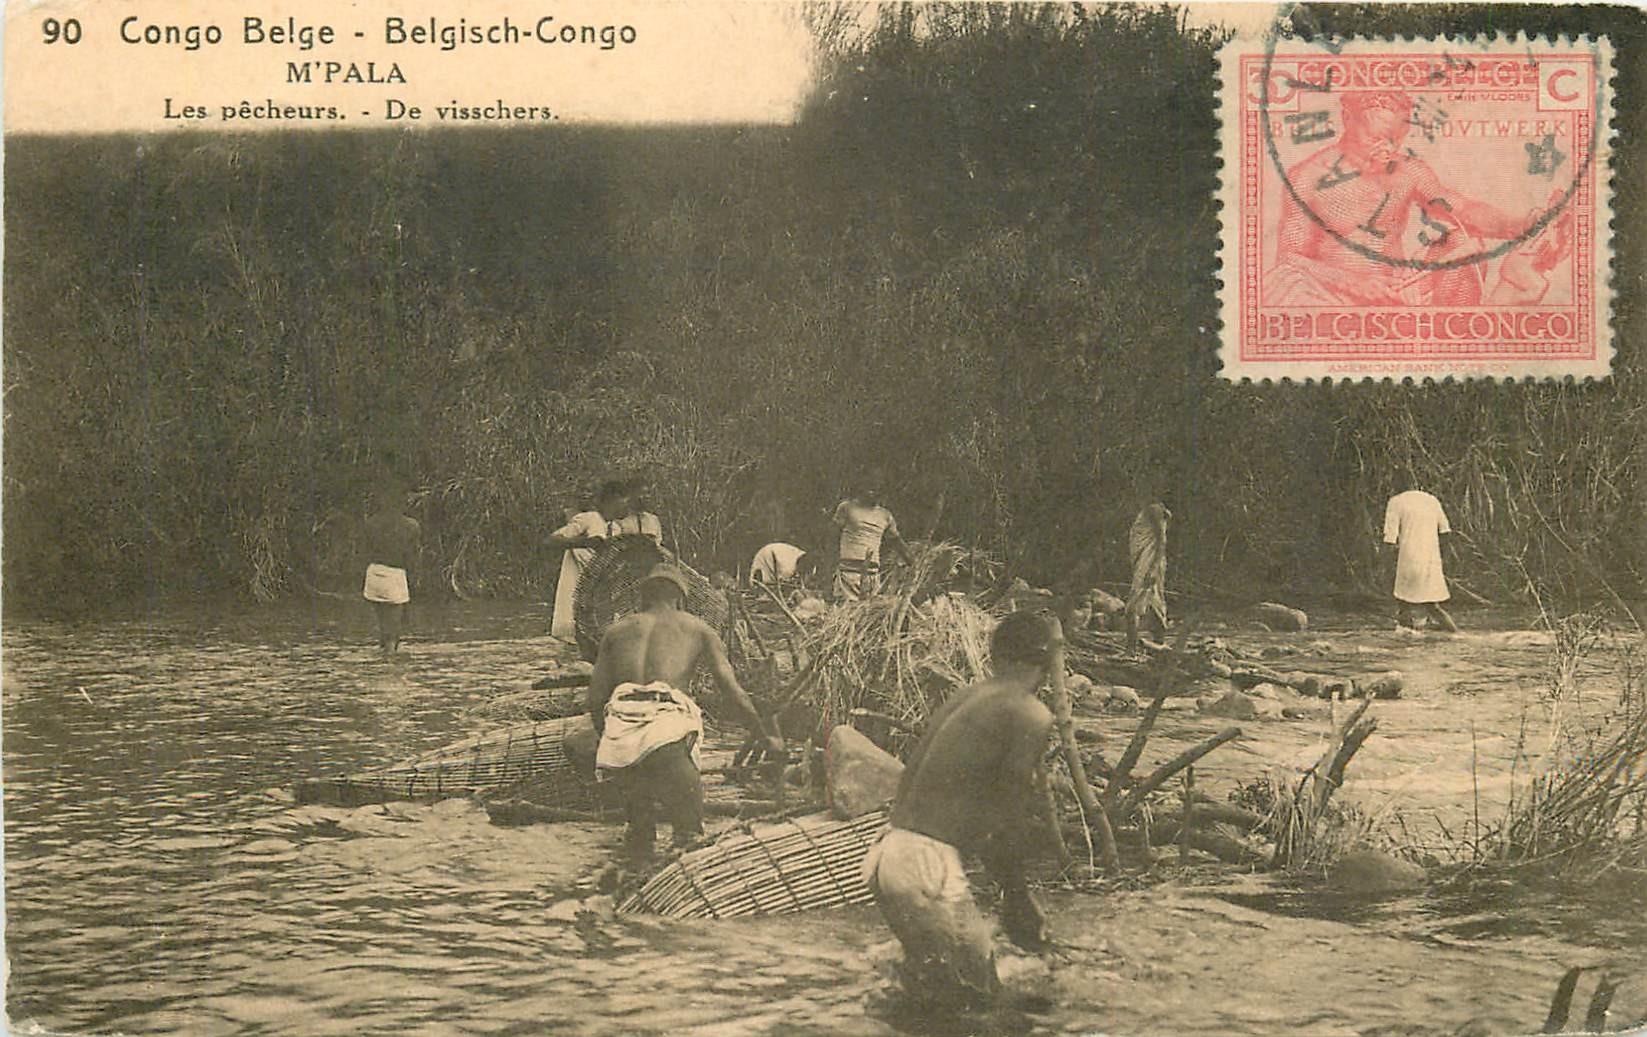 CONGO BELGE. M'Pala. Les Pêcheurs 1925